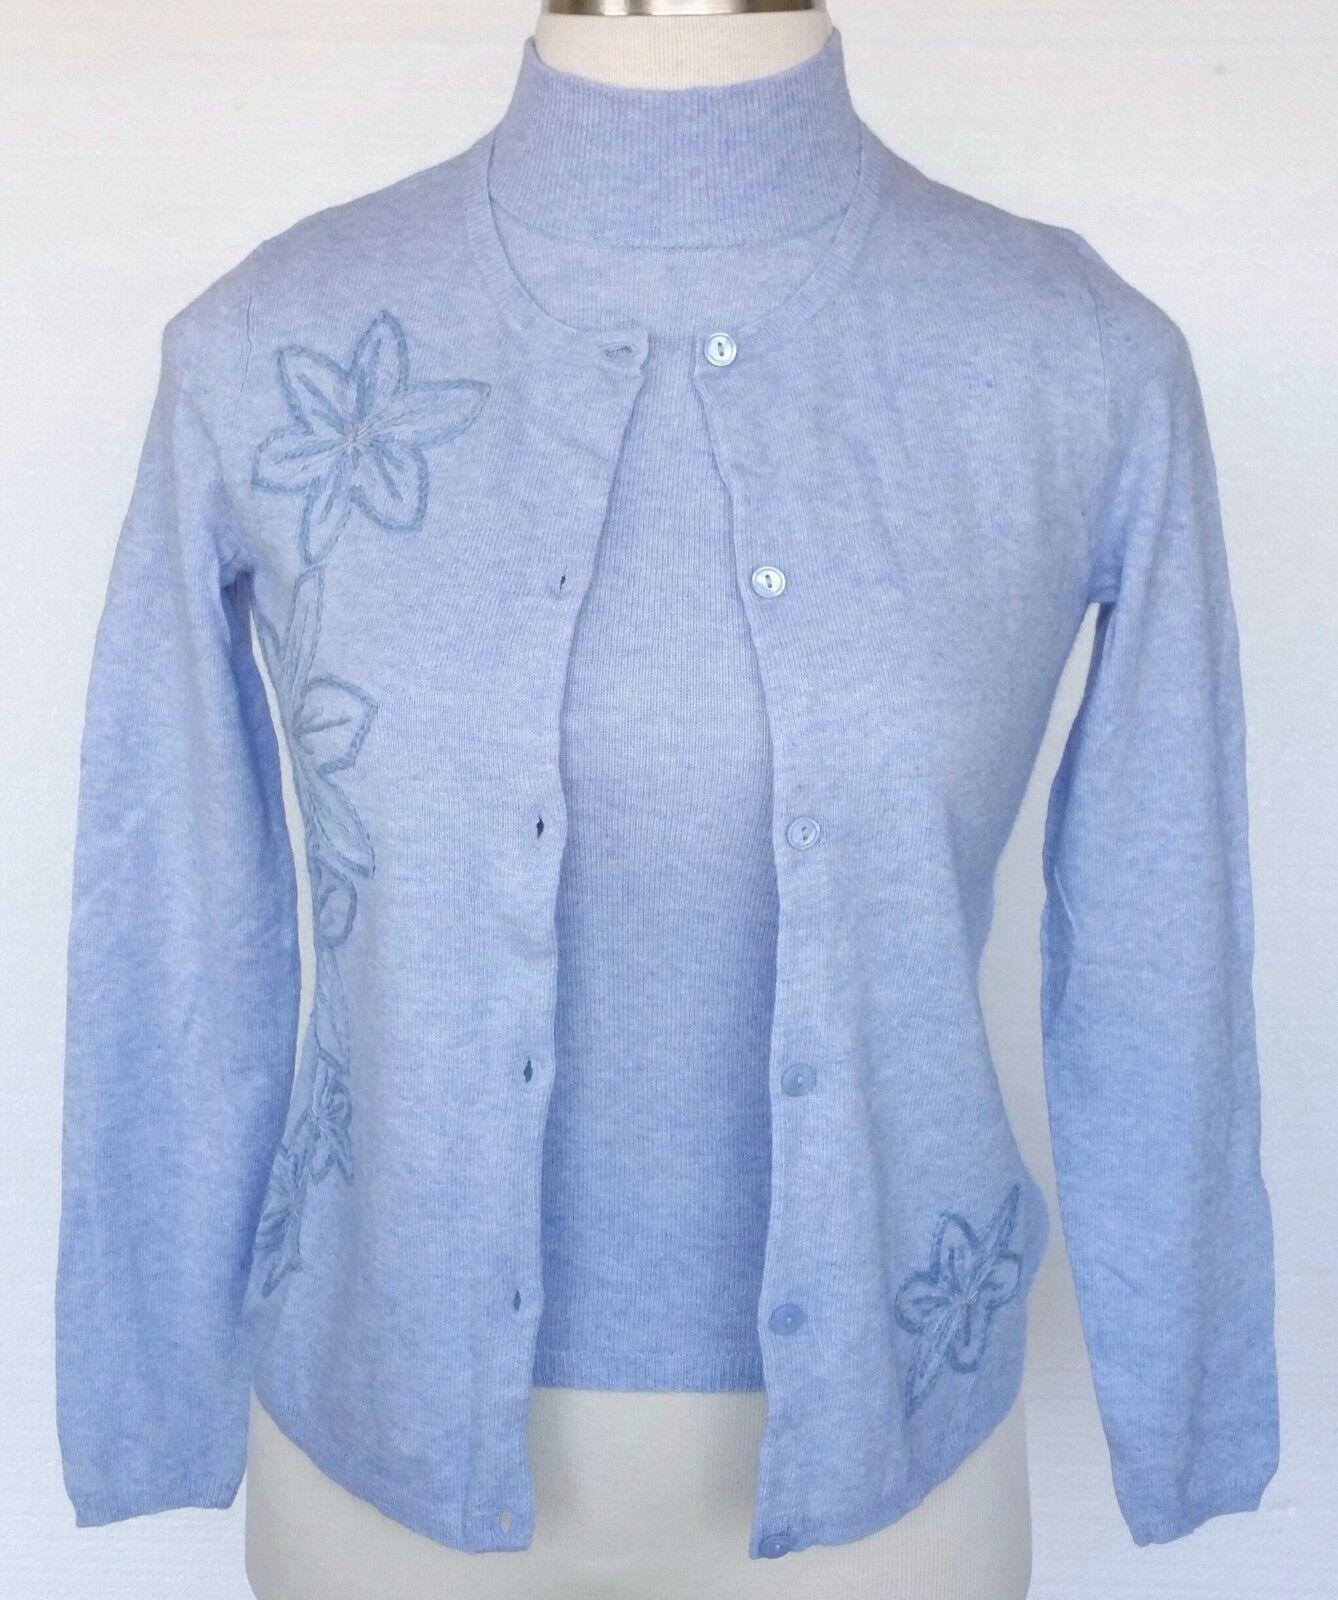 Randolph Duke Cardigan Sweater & Tank Top 2 pc Set New Angora Cashmere Blend S